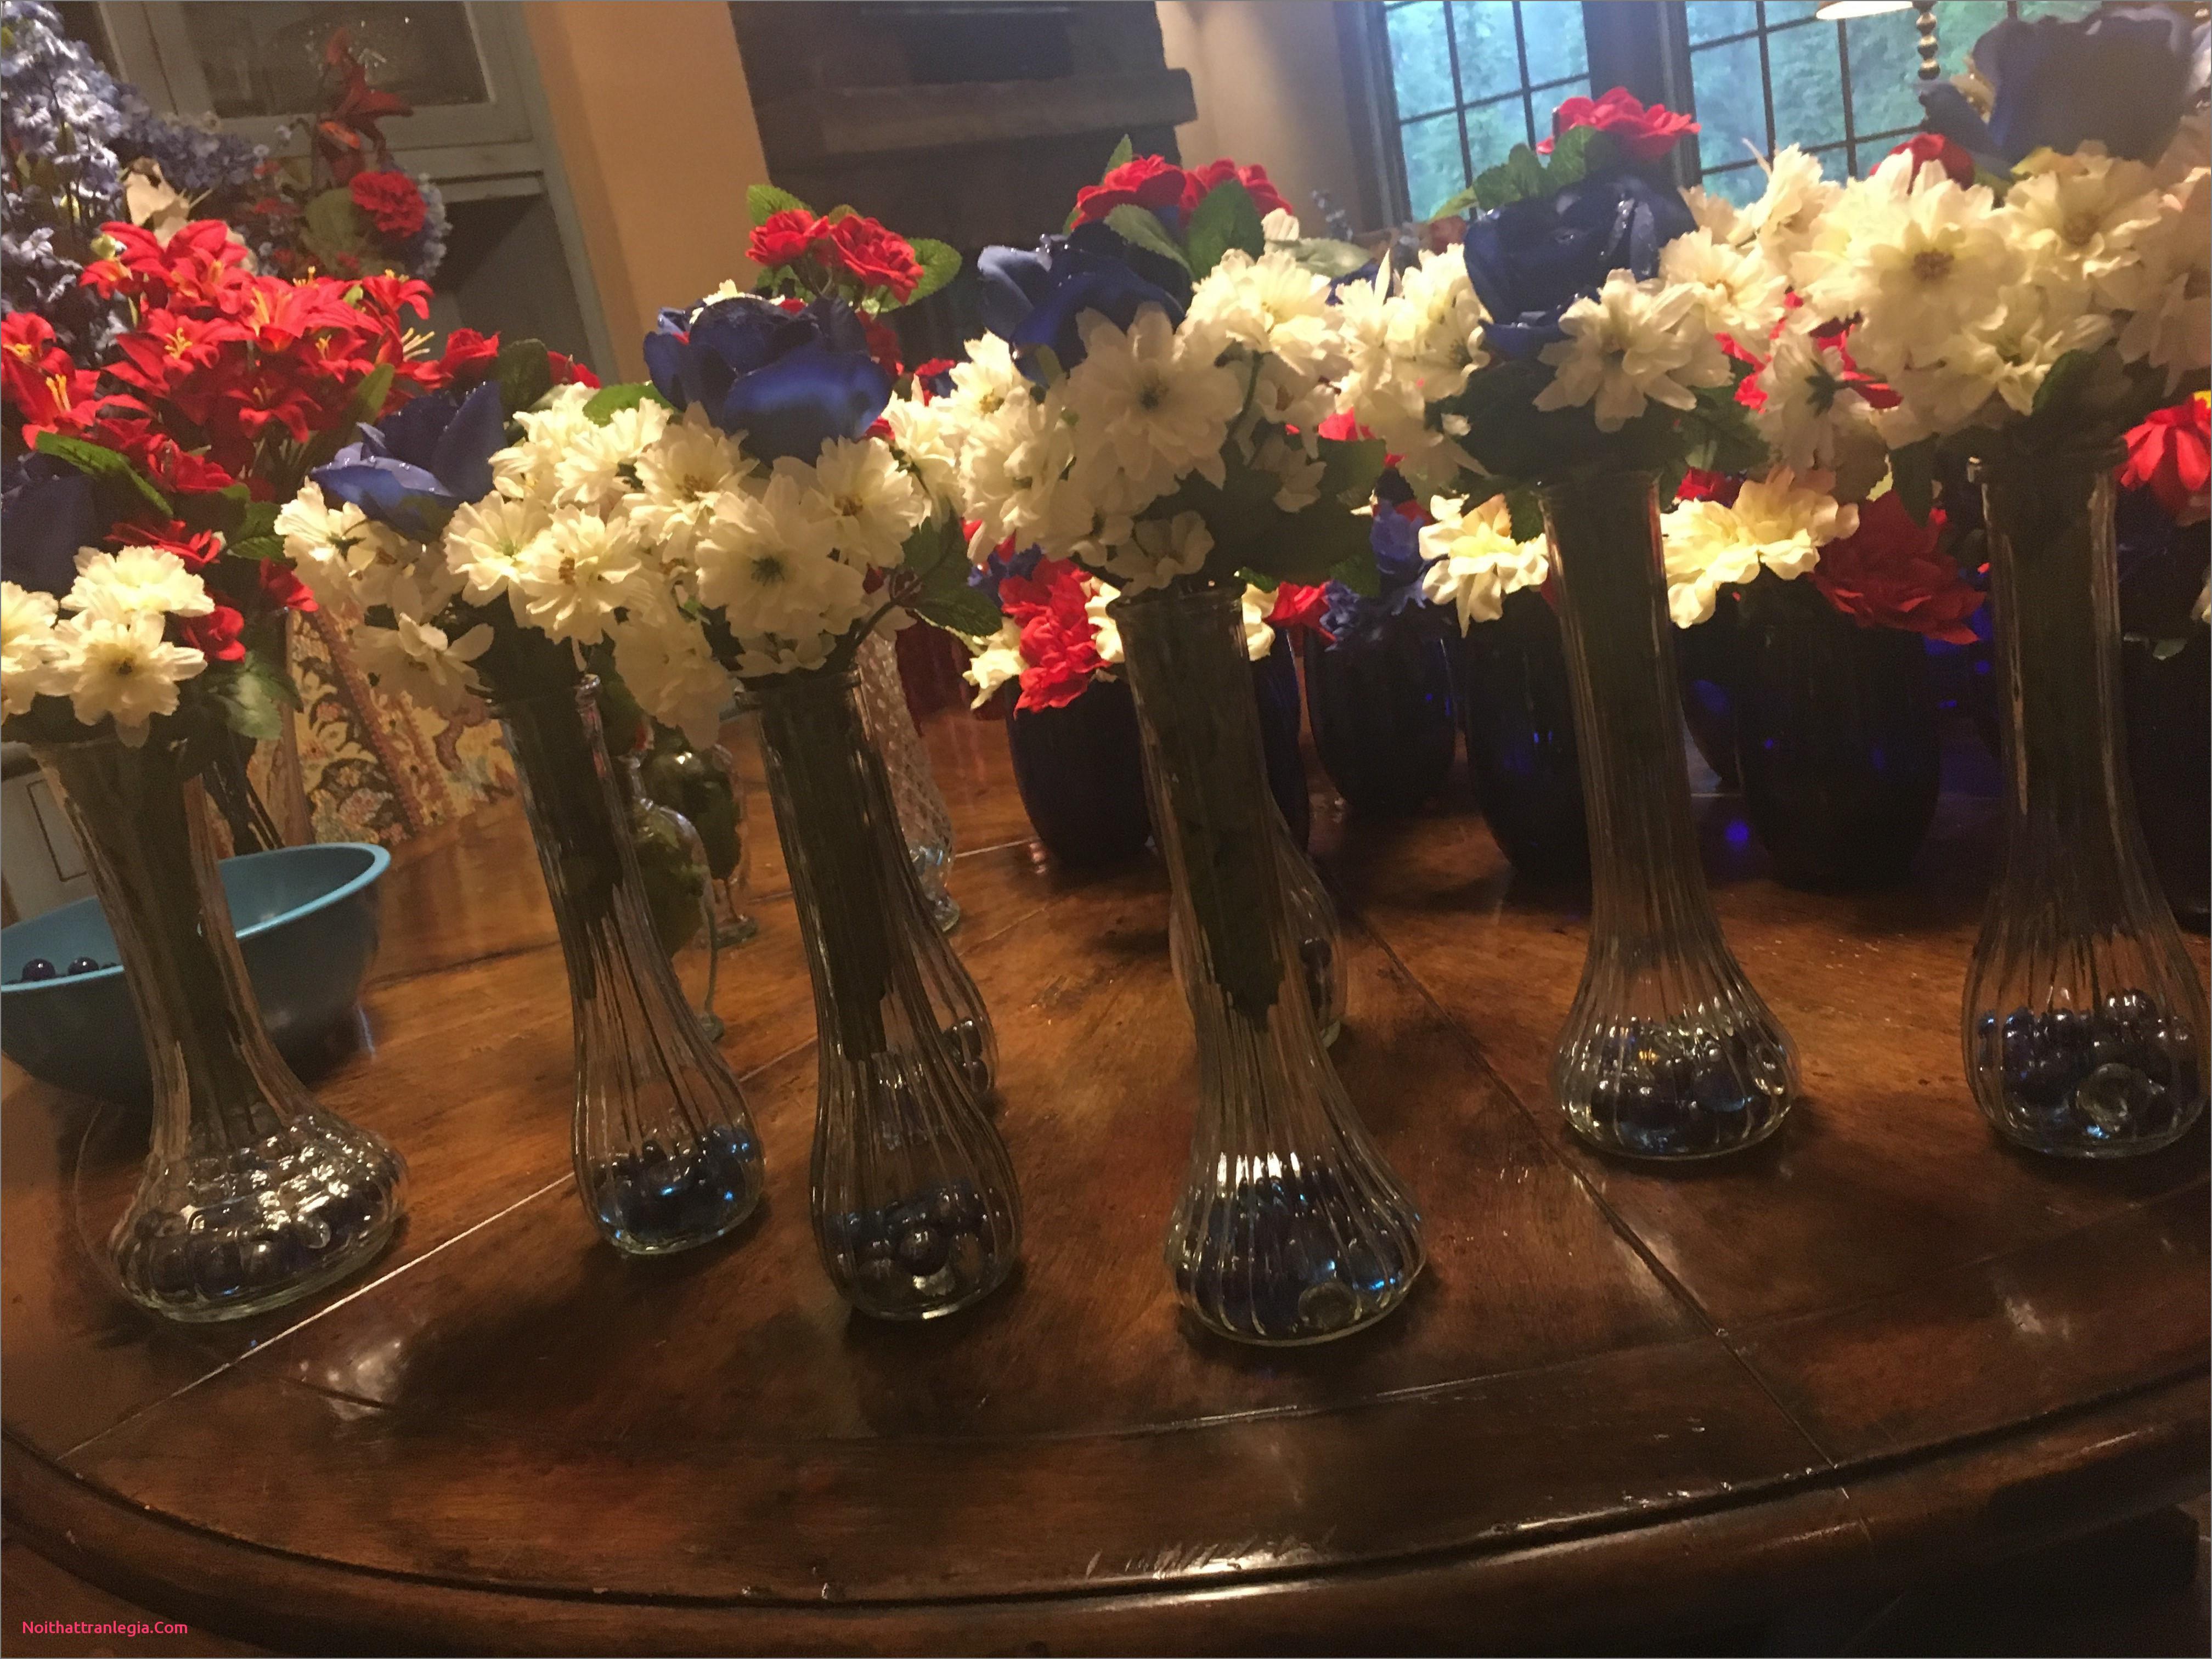 waterford crystal flower vase of 20 wedding vases noithattranlegia vases design within decoration line luxury dollar tree wedding decorations awesome h vases dollar vase i 0d